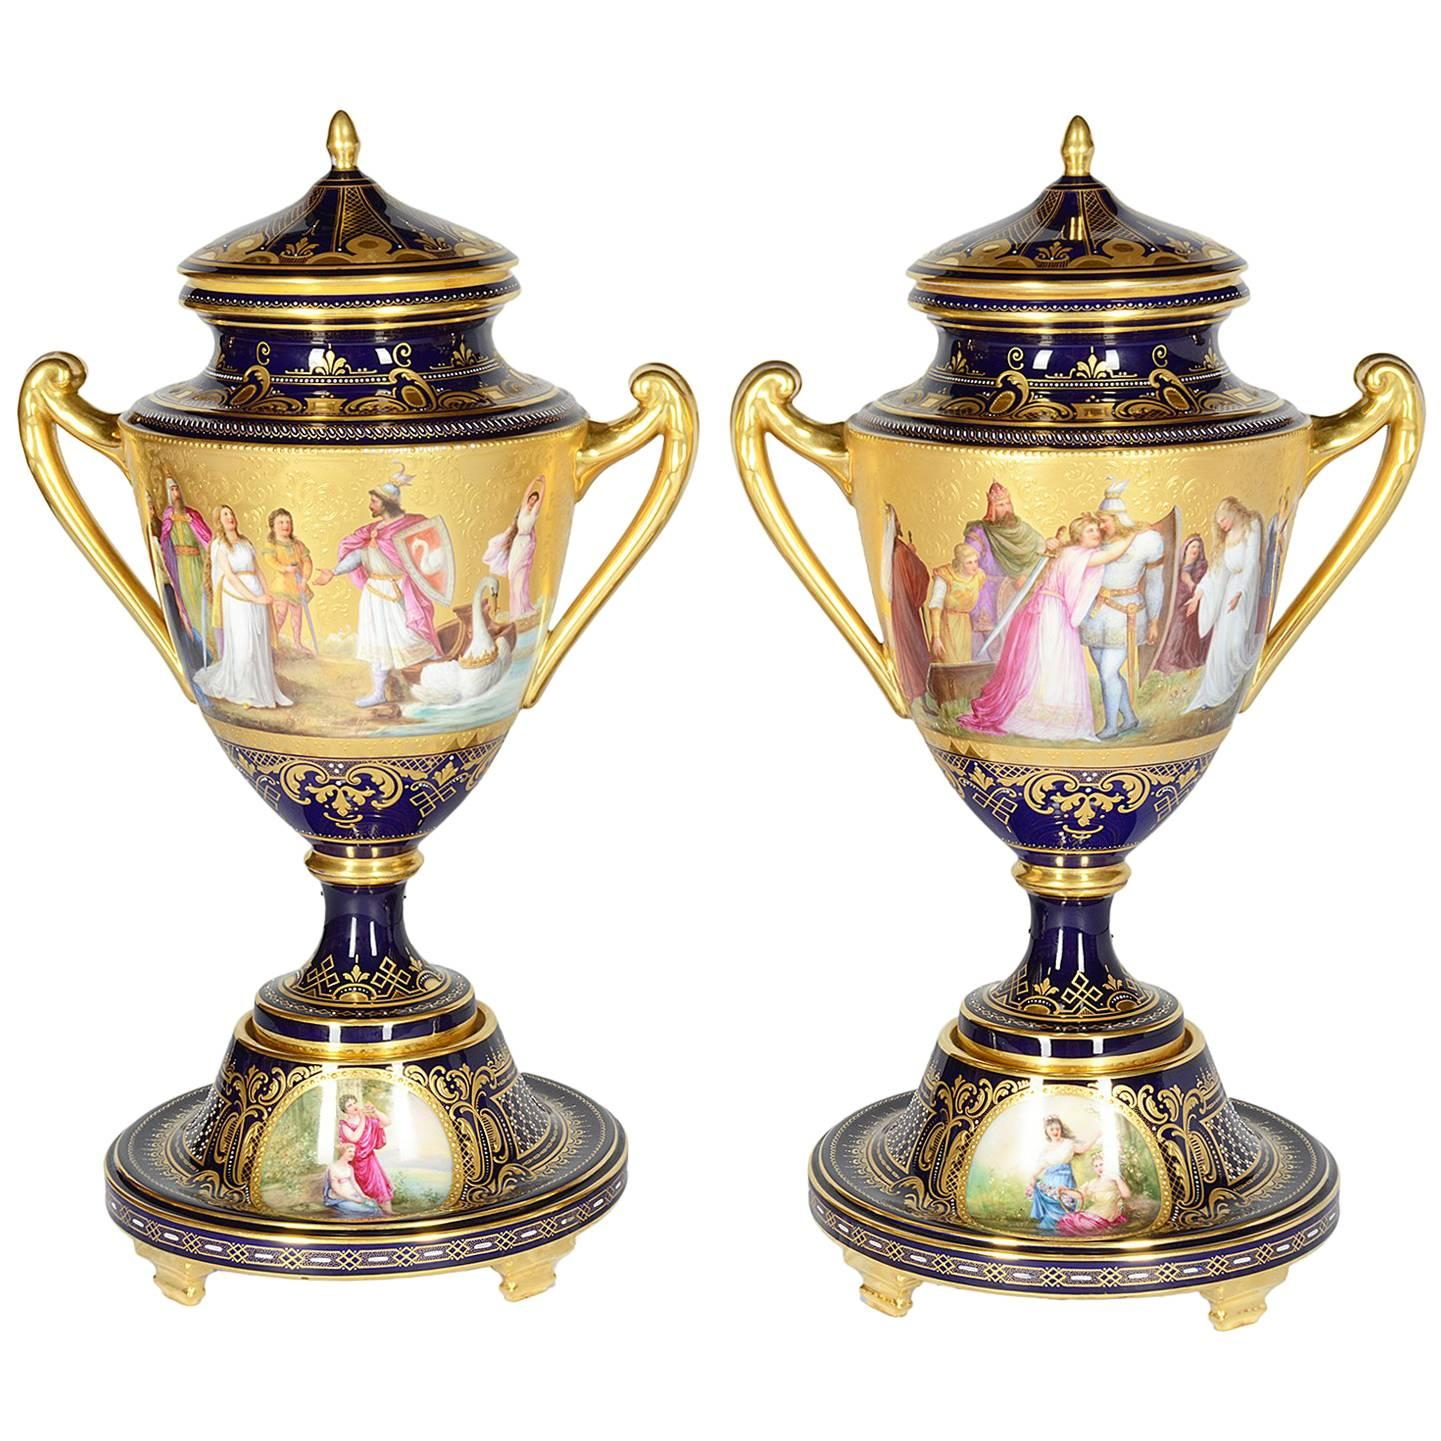 Large Pair of 19th Century Vienna Porcelain Urns